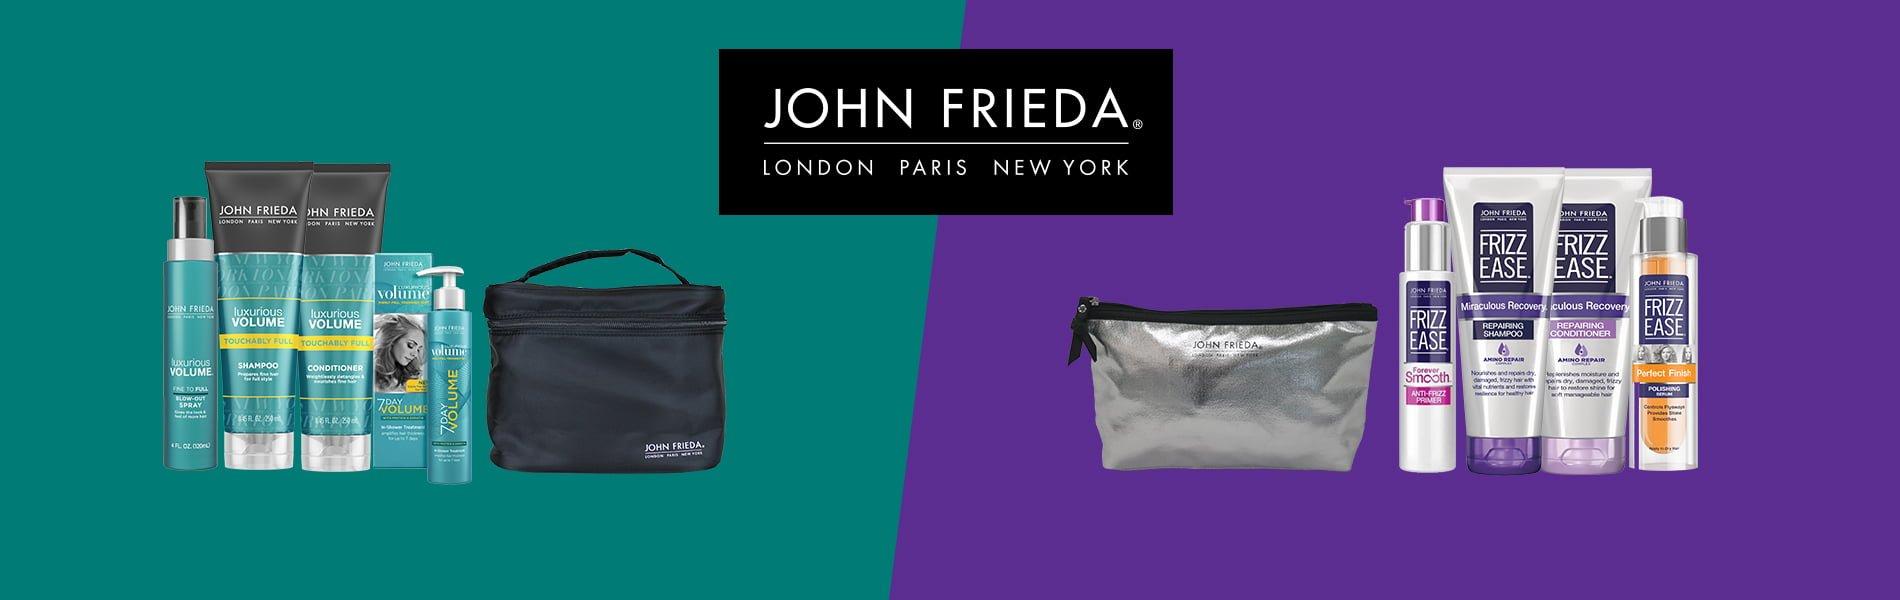 John Frieda Showbag